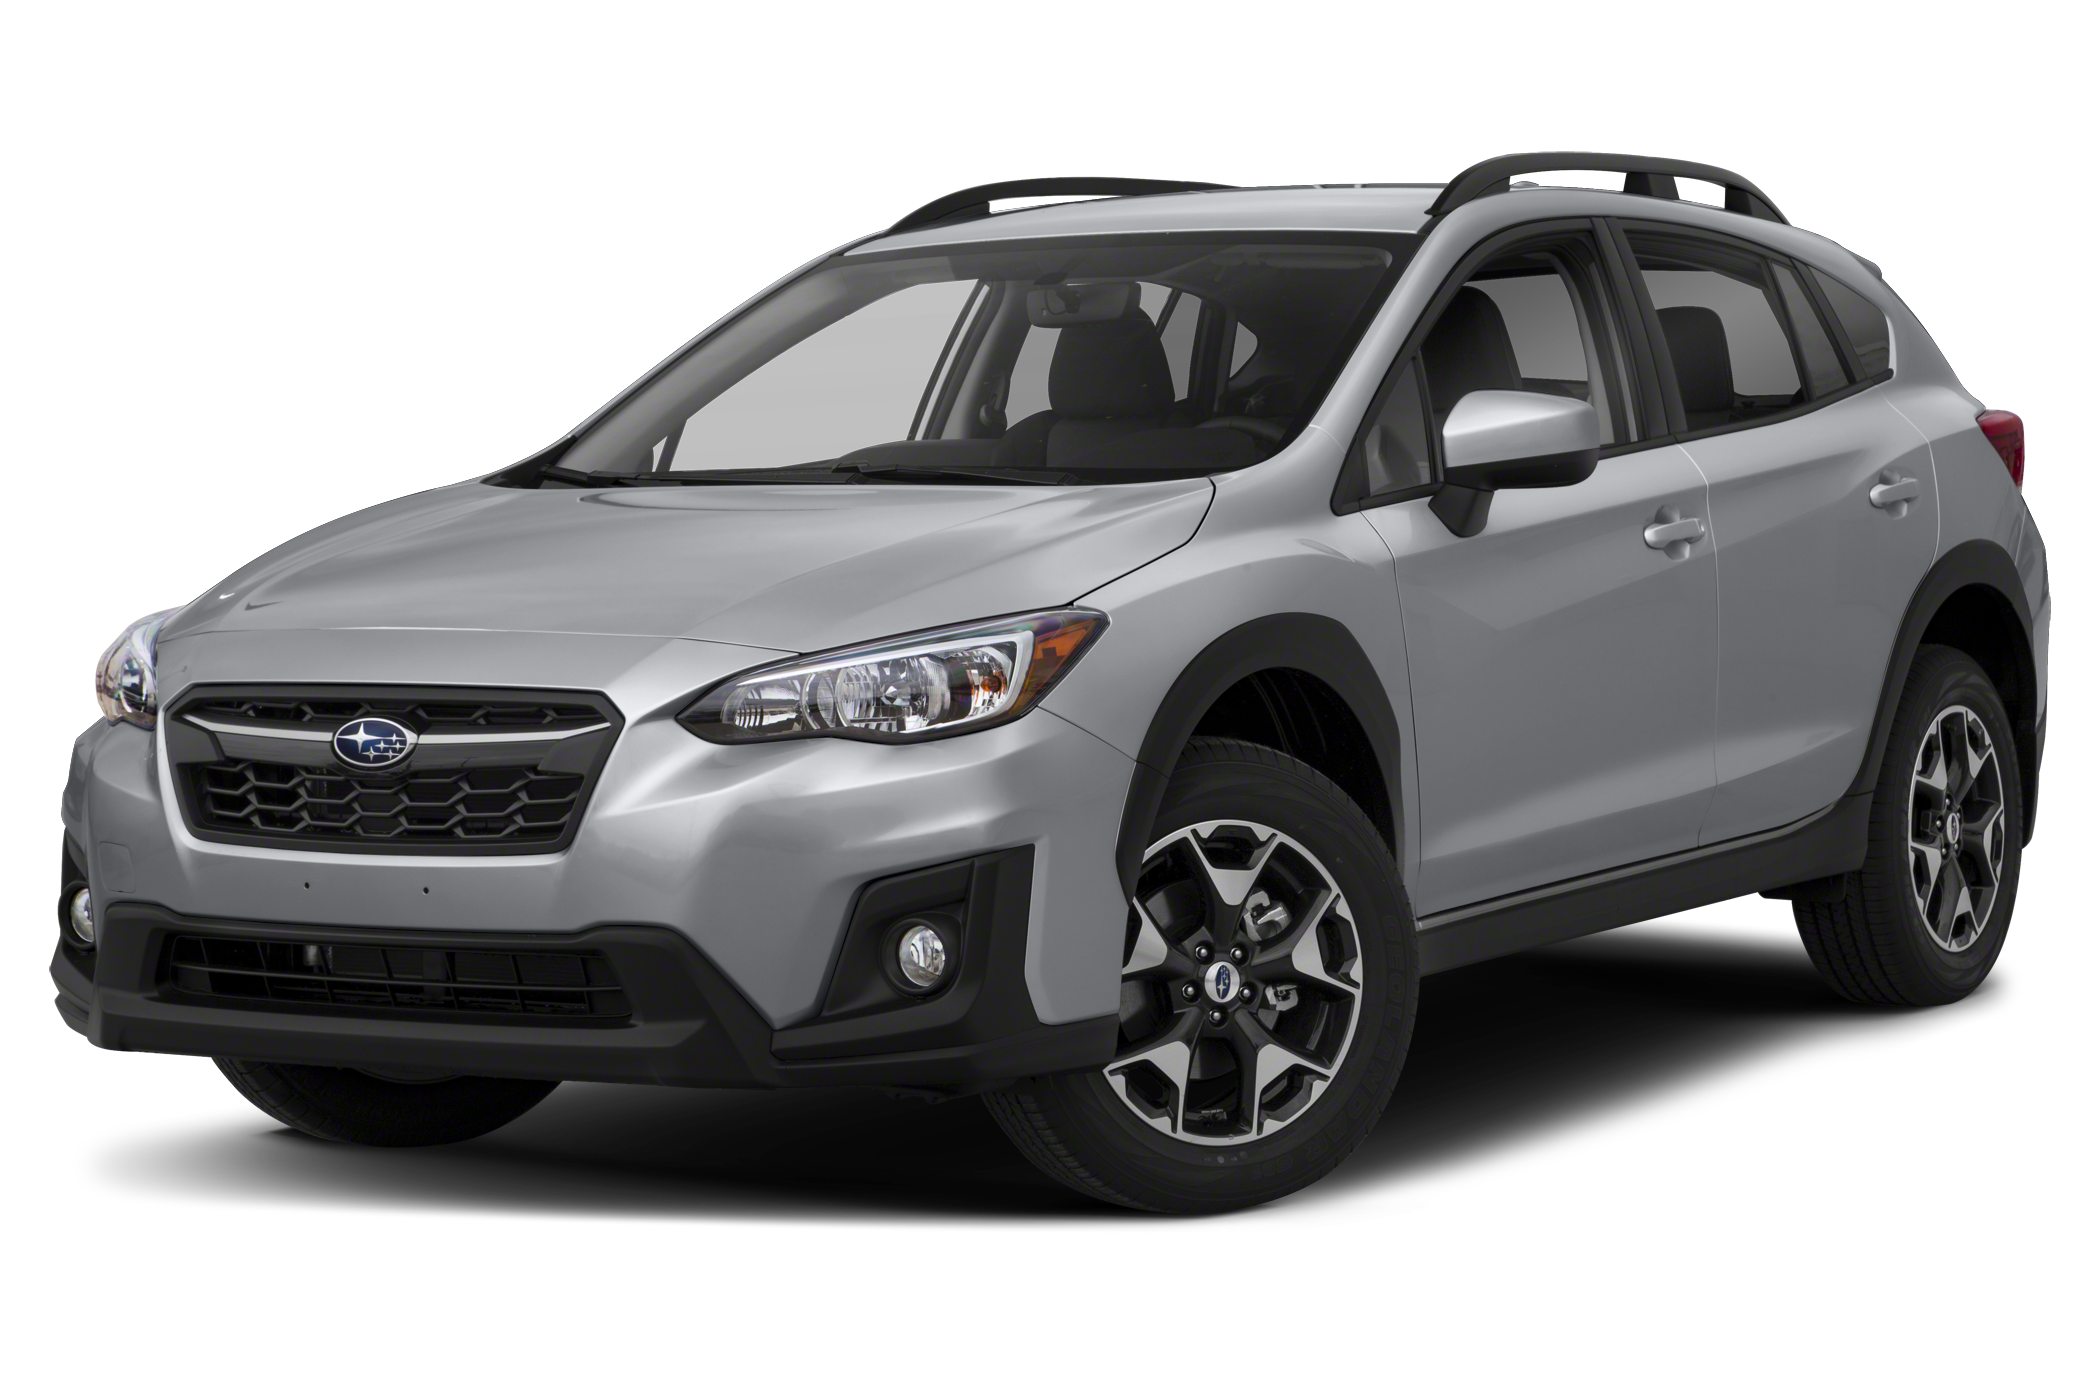 Compare Subaru/Crosstrek to Subaru/Forester